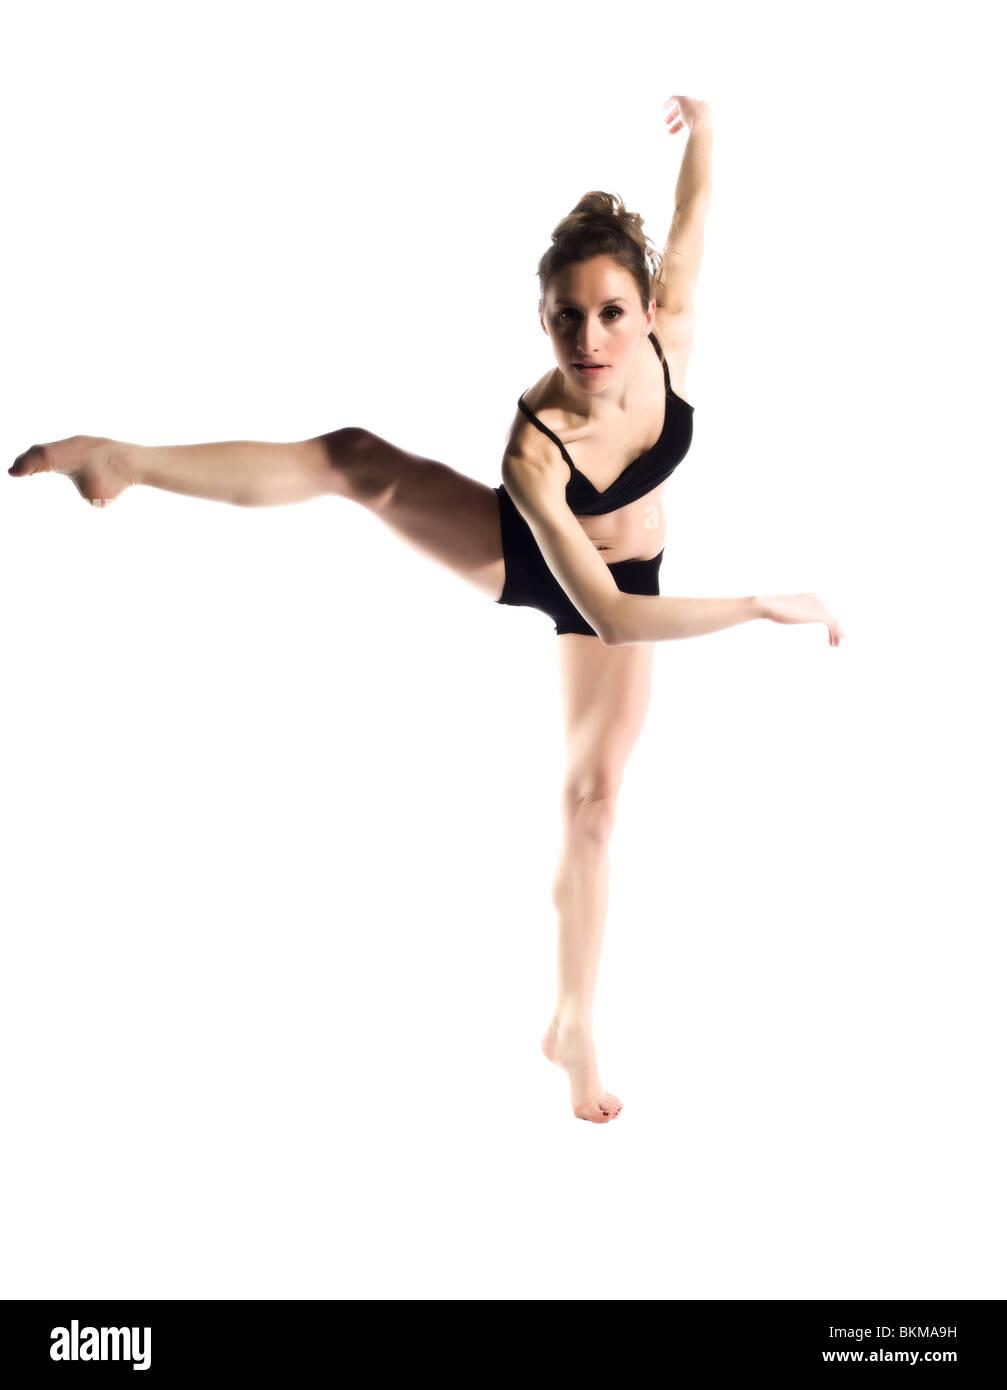 female ballerina on white background - Stock Image